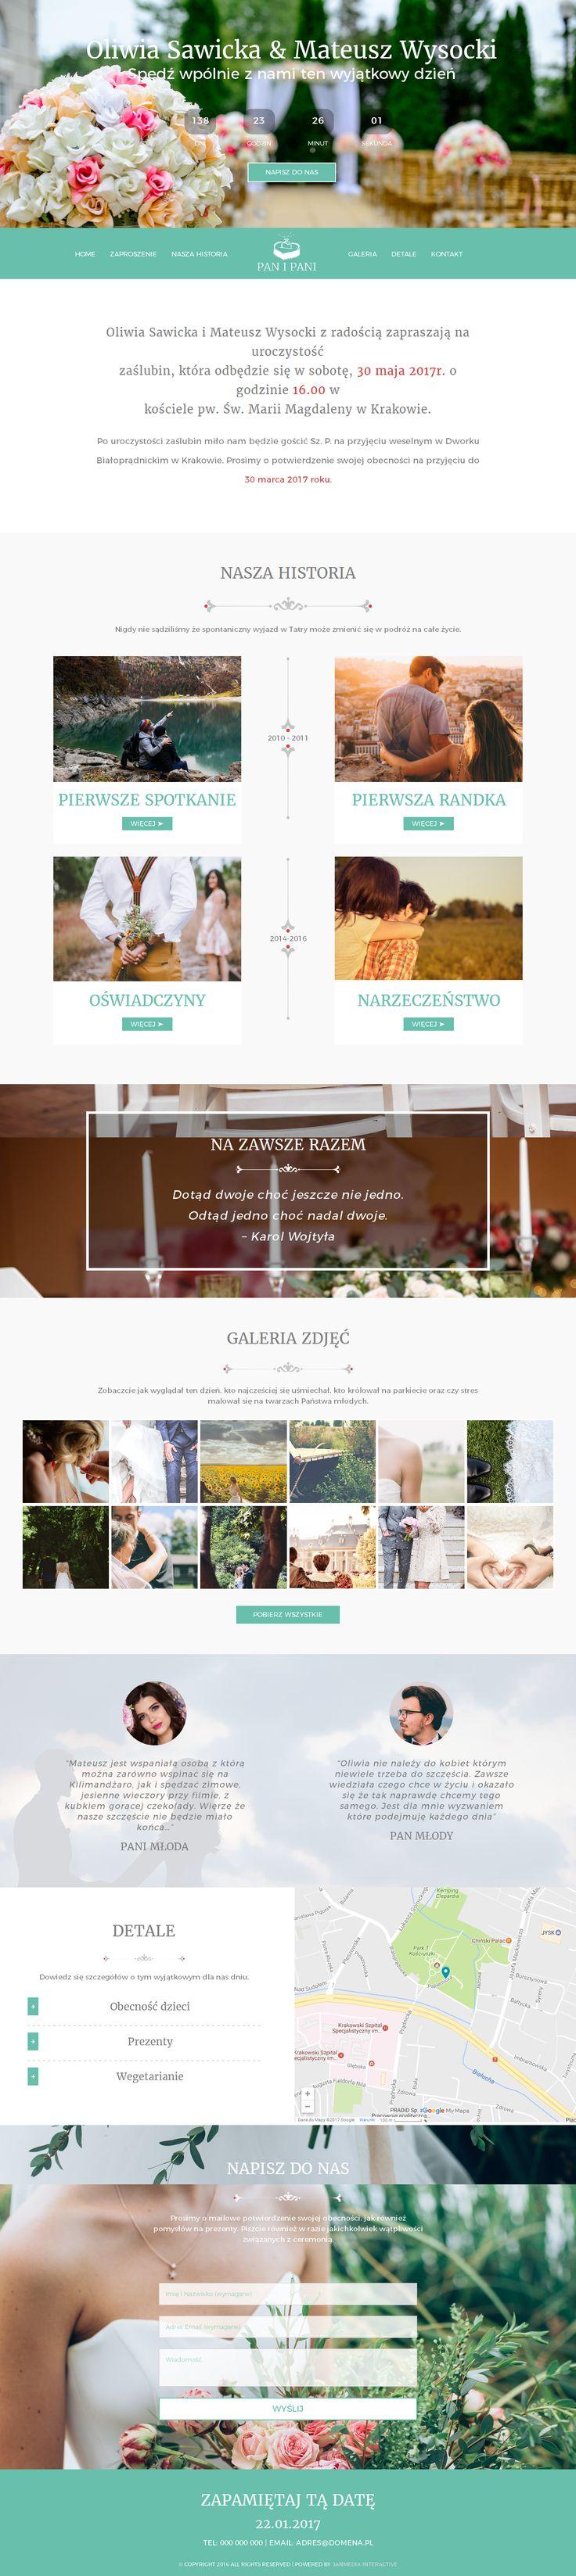 #wedding #site #justmaried #www #webdesign